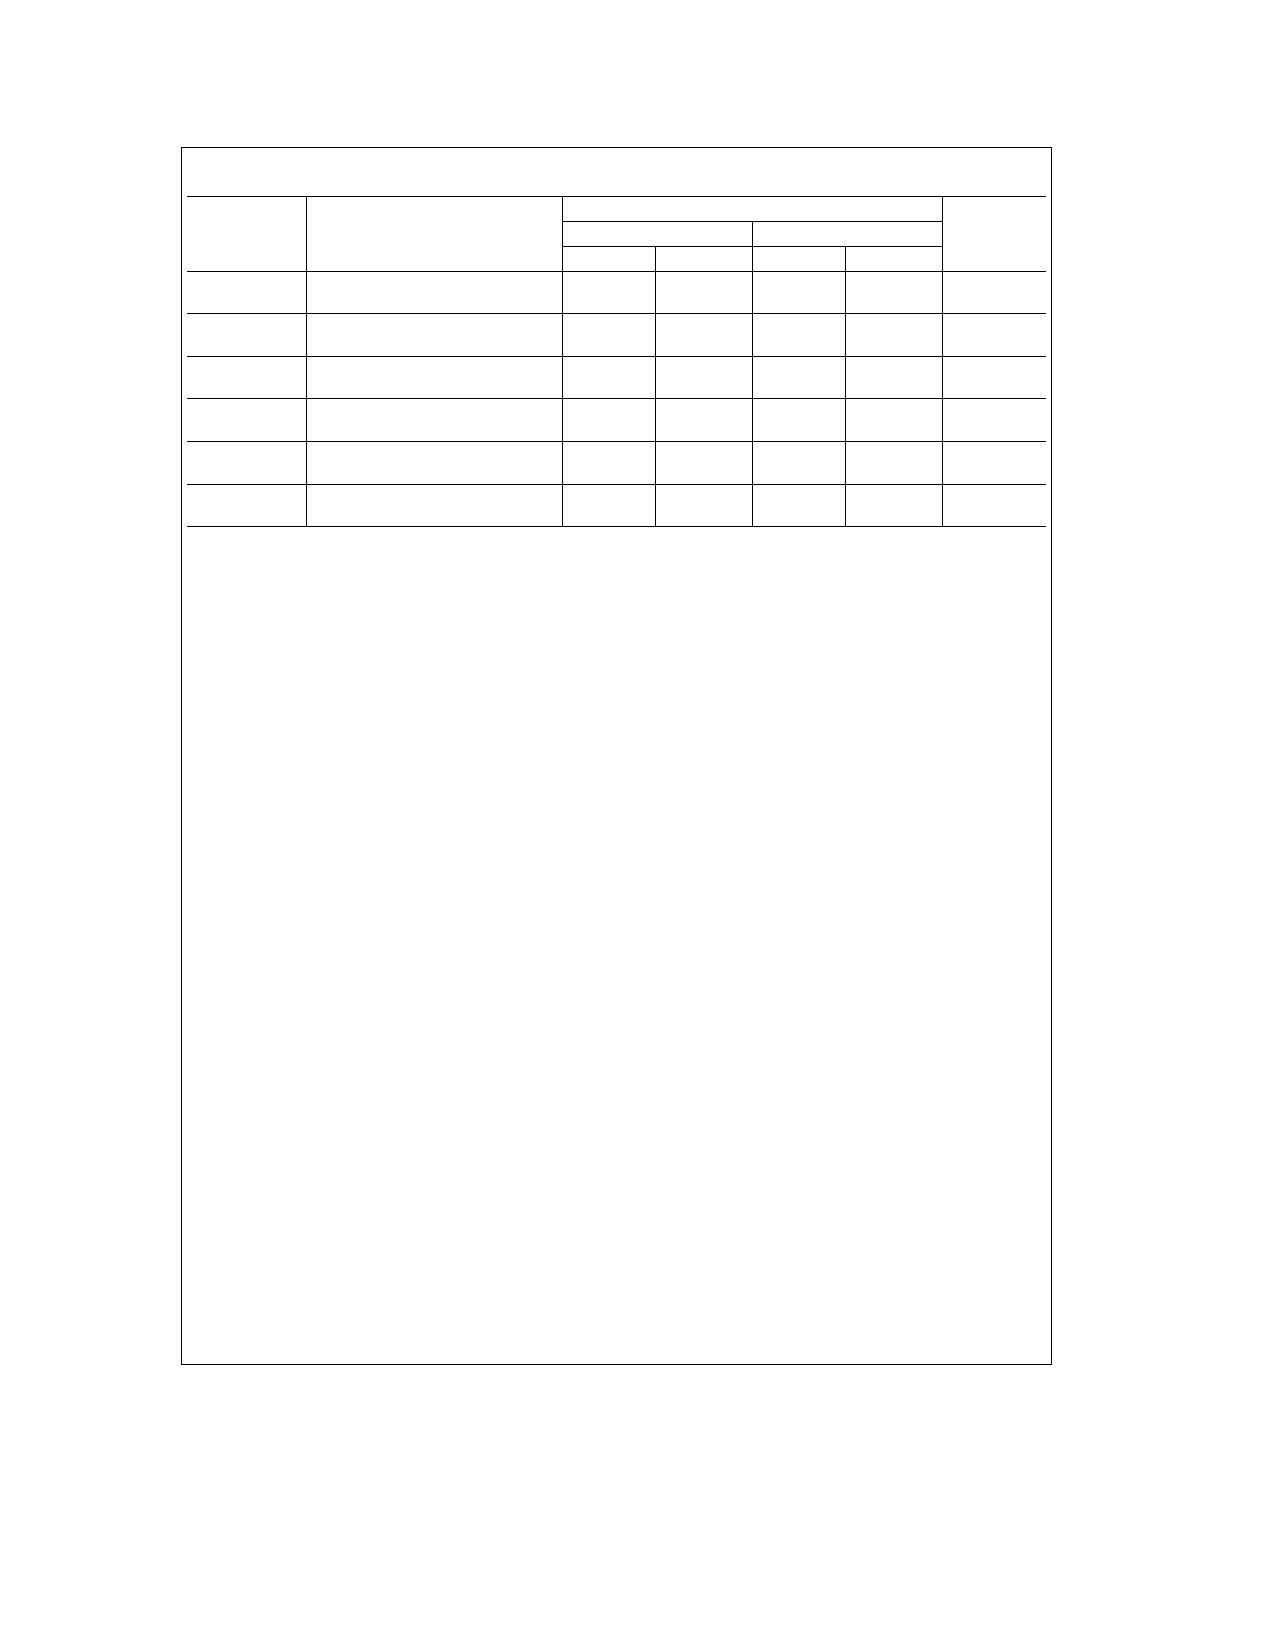 54LS367A pdf, ピン配列